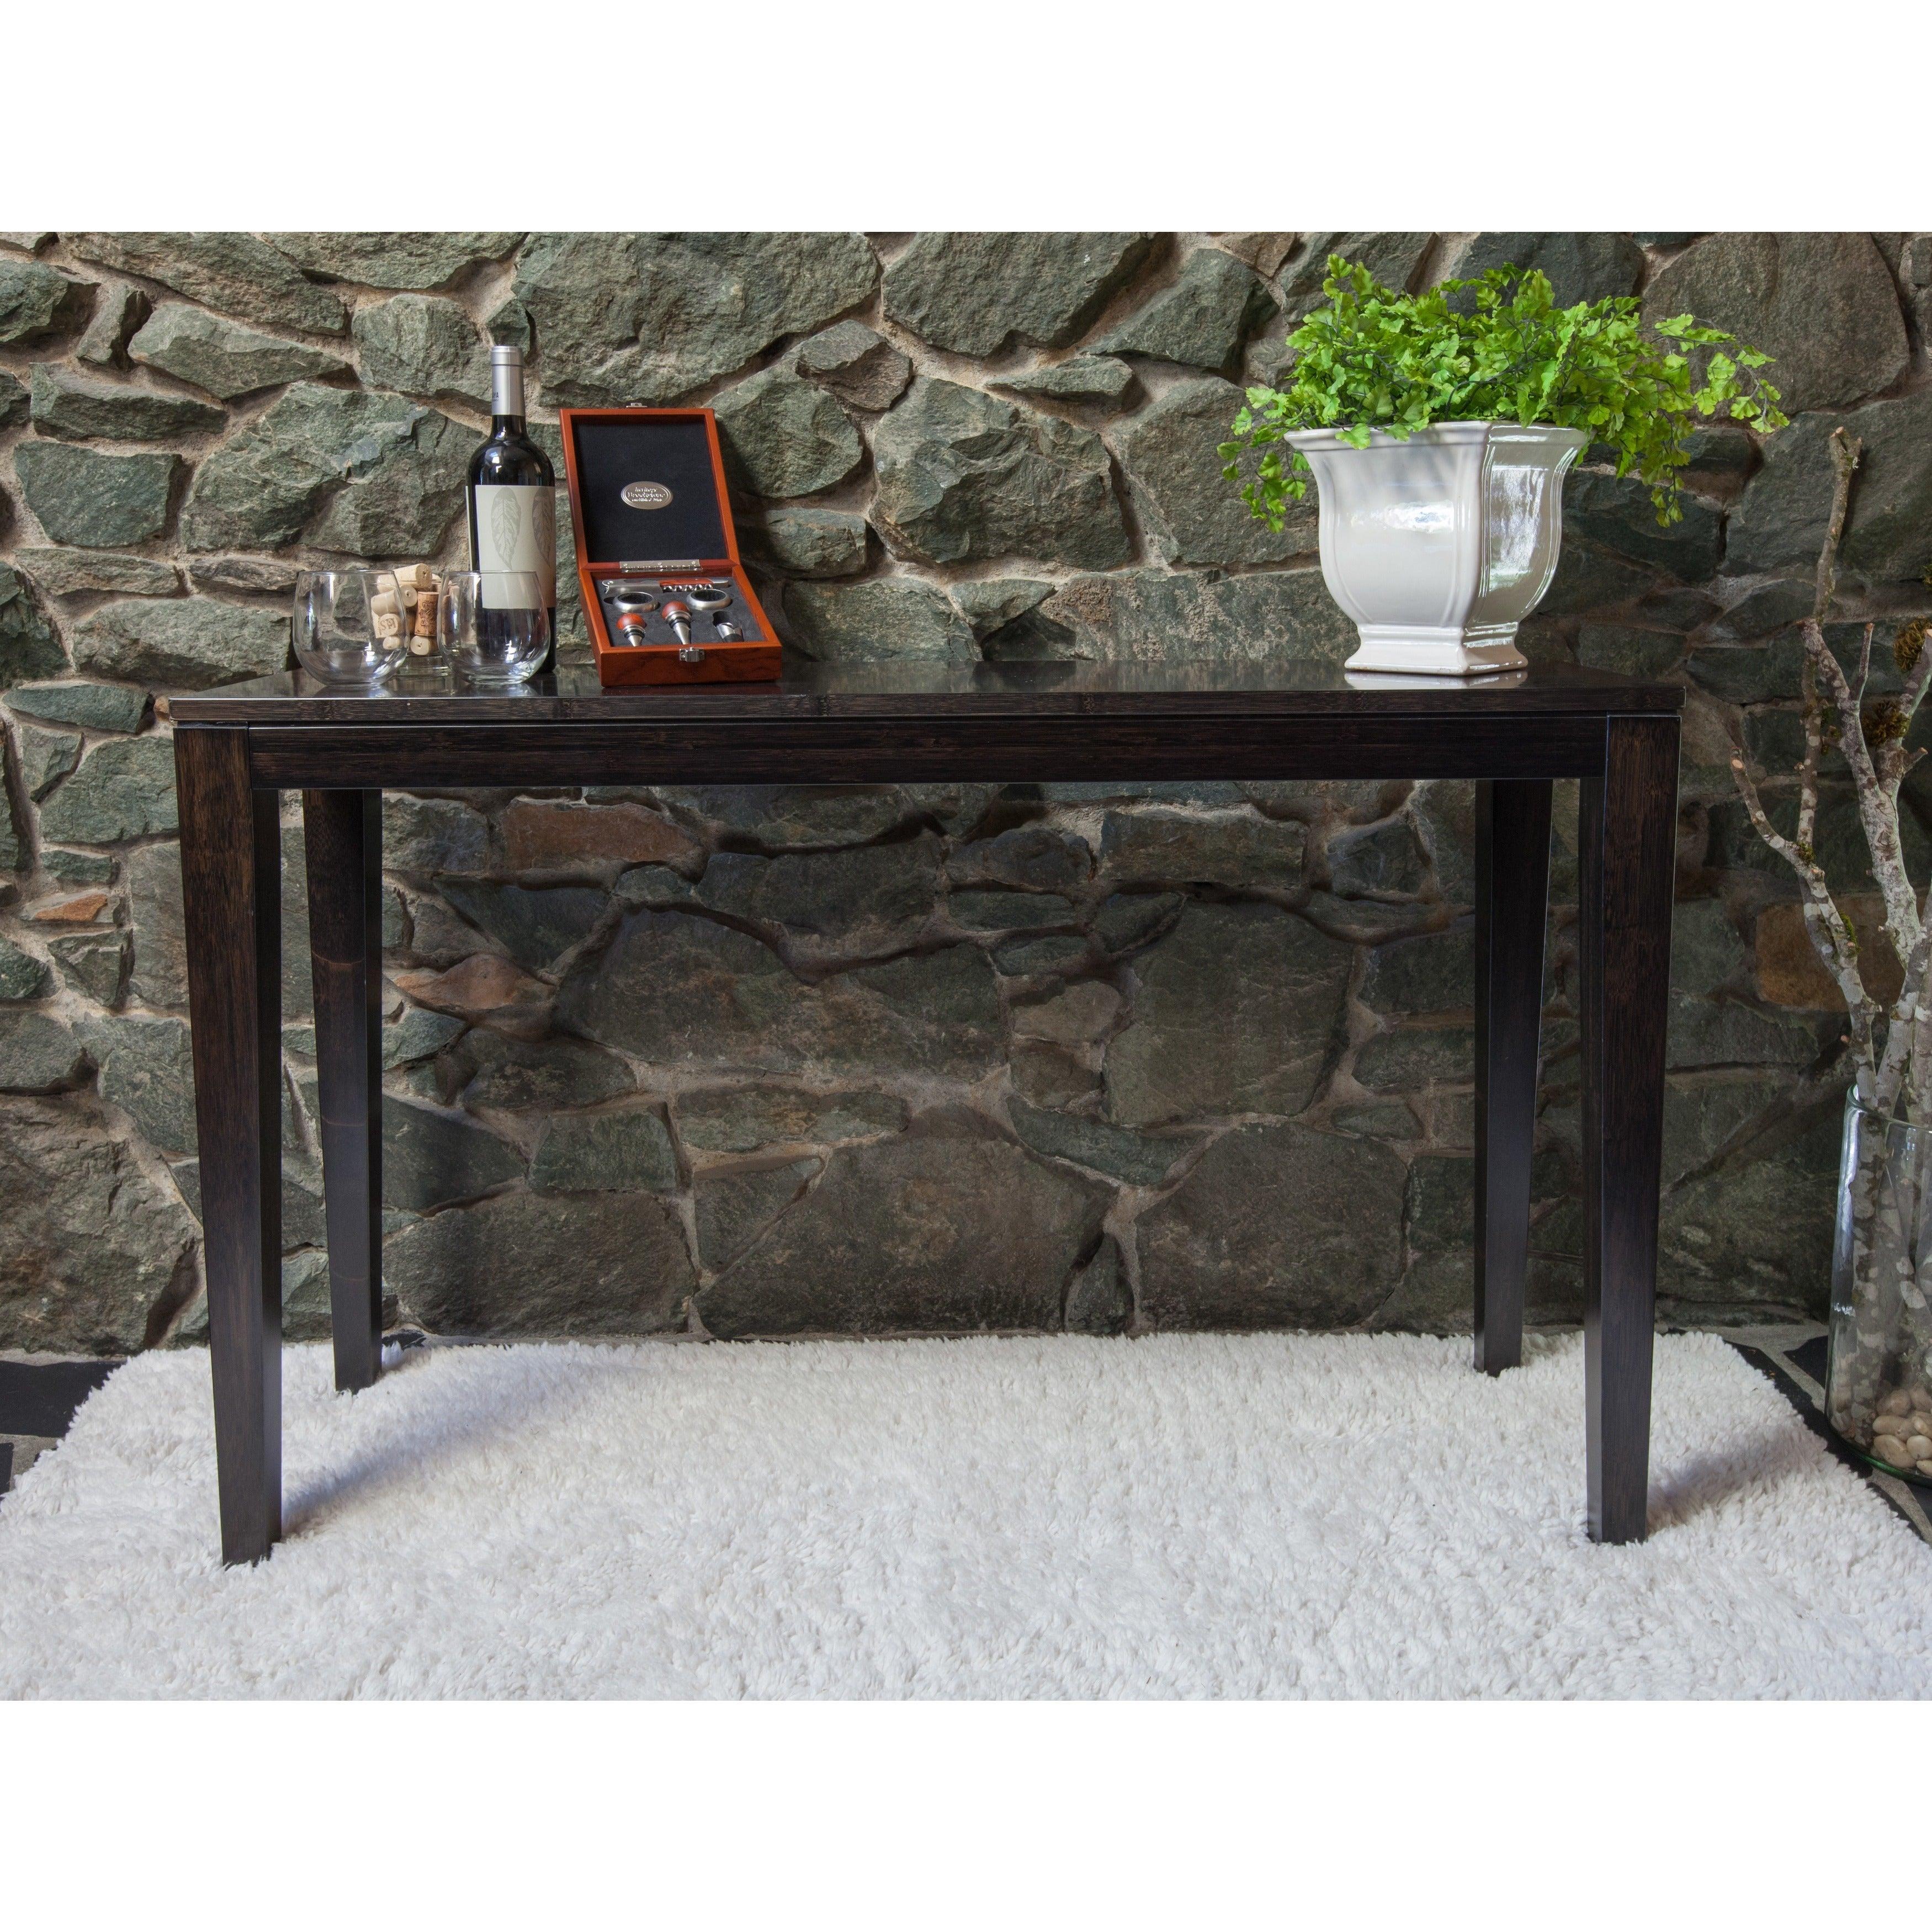 Bamboogle Sturdy Narrow Console Table